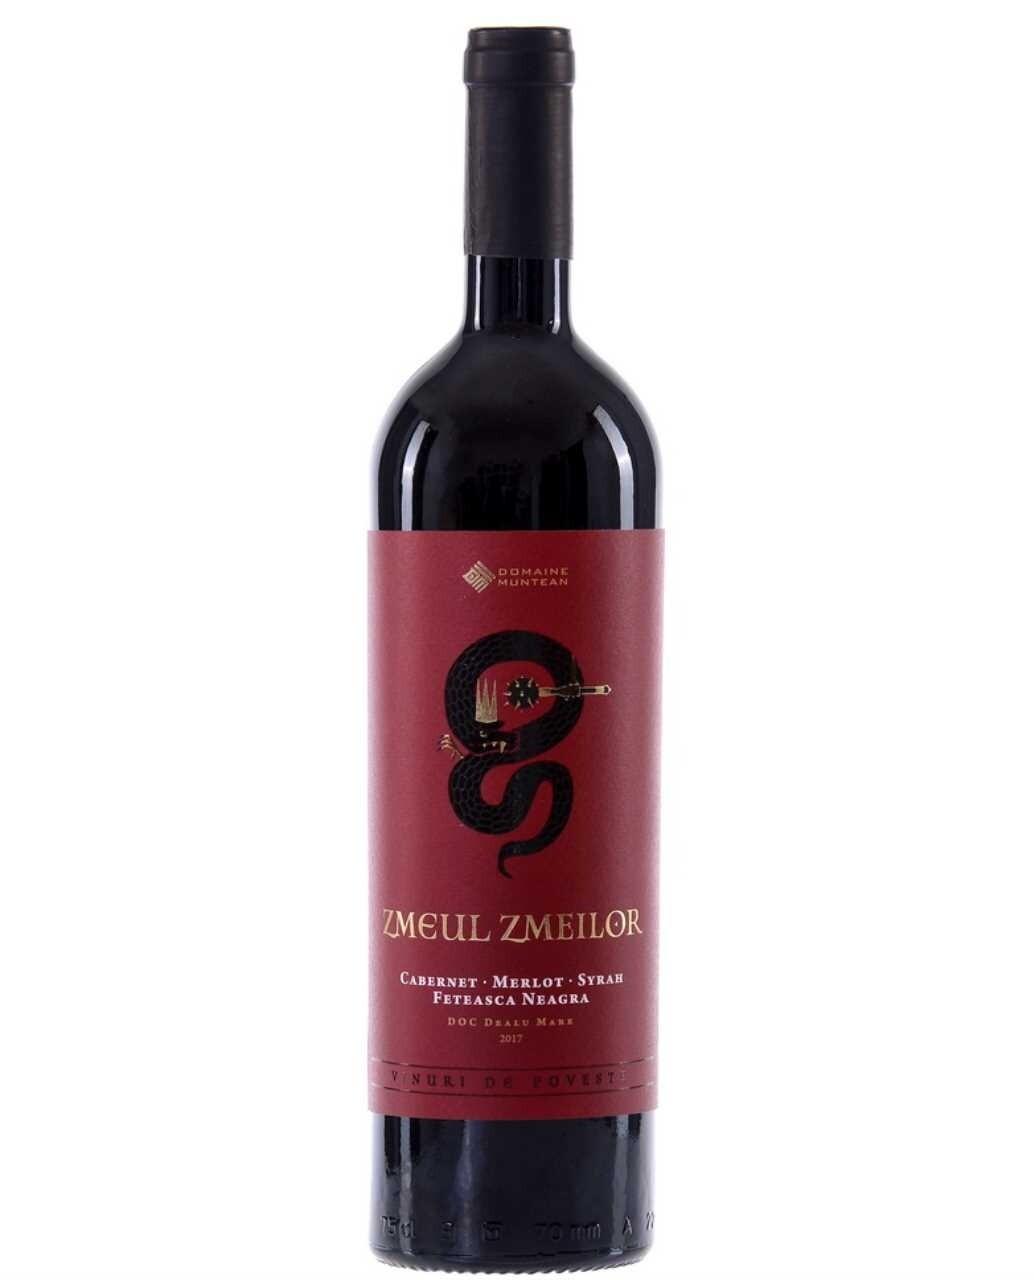 Domeniul Muntean Zmeul Zmeilor Limited Edition